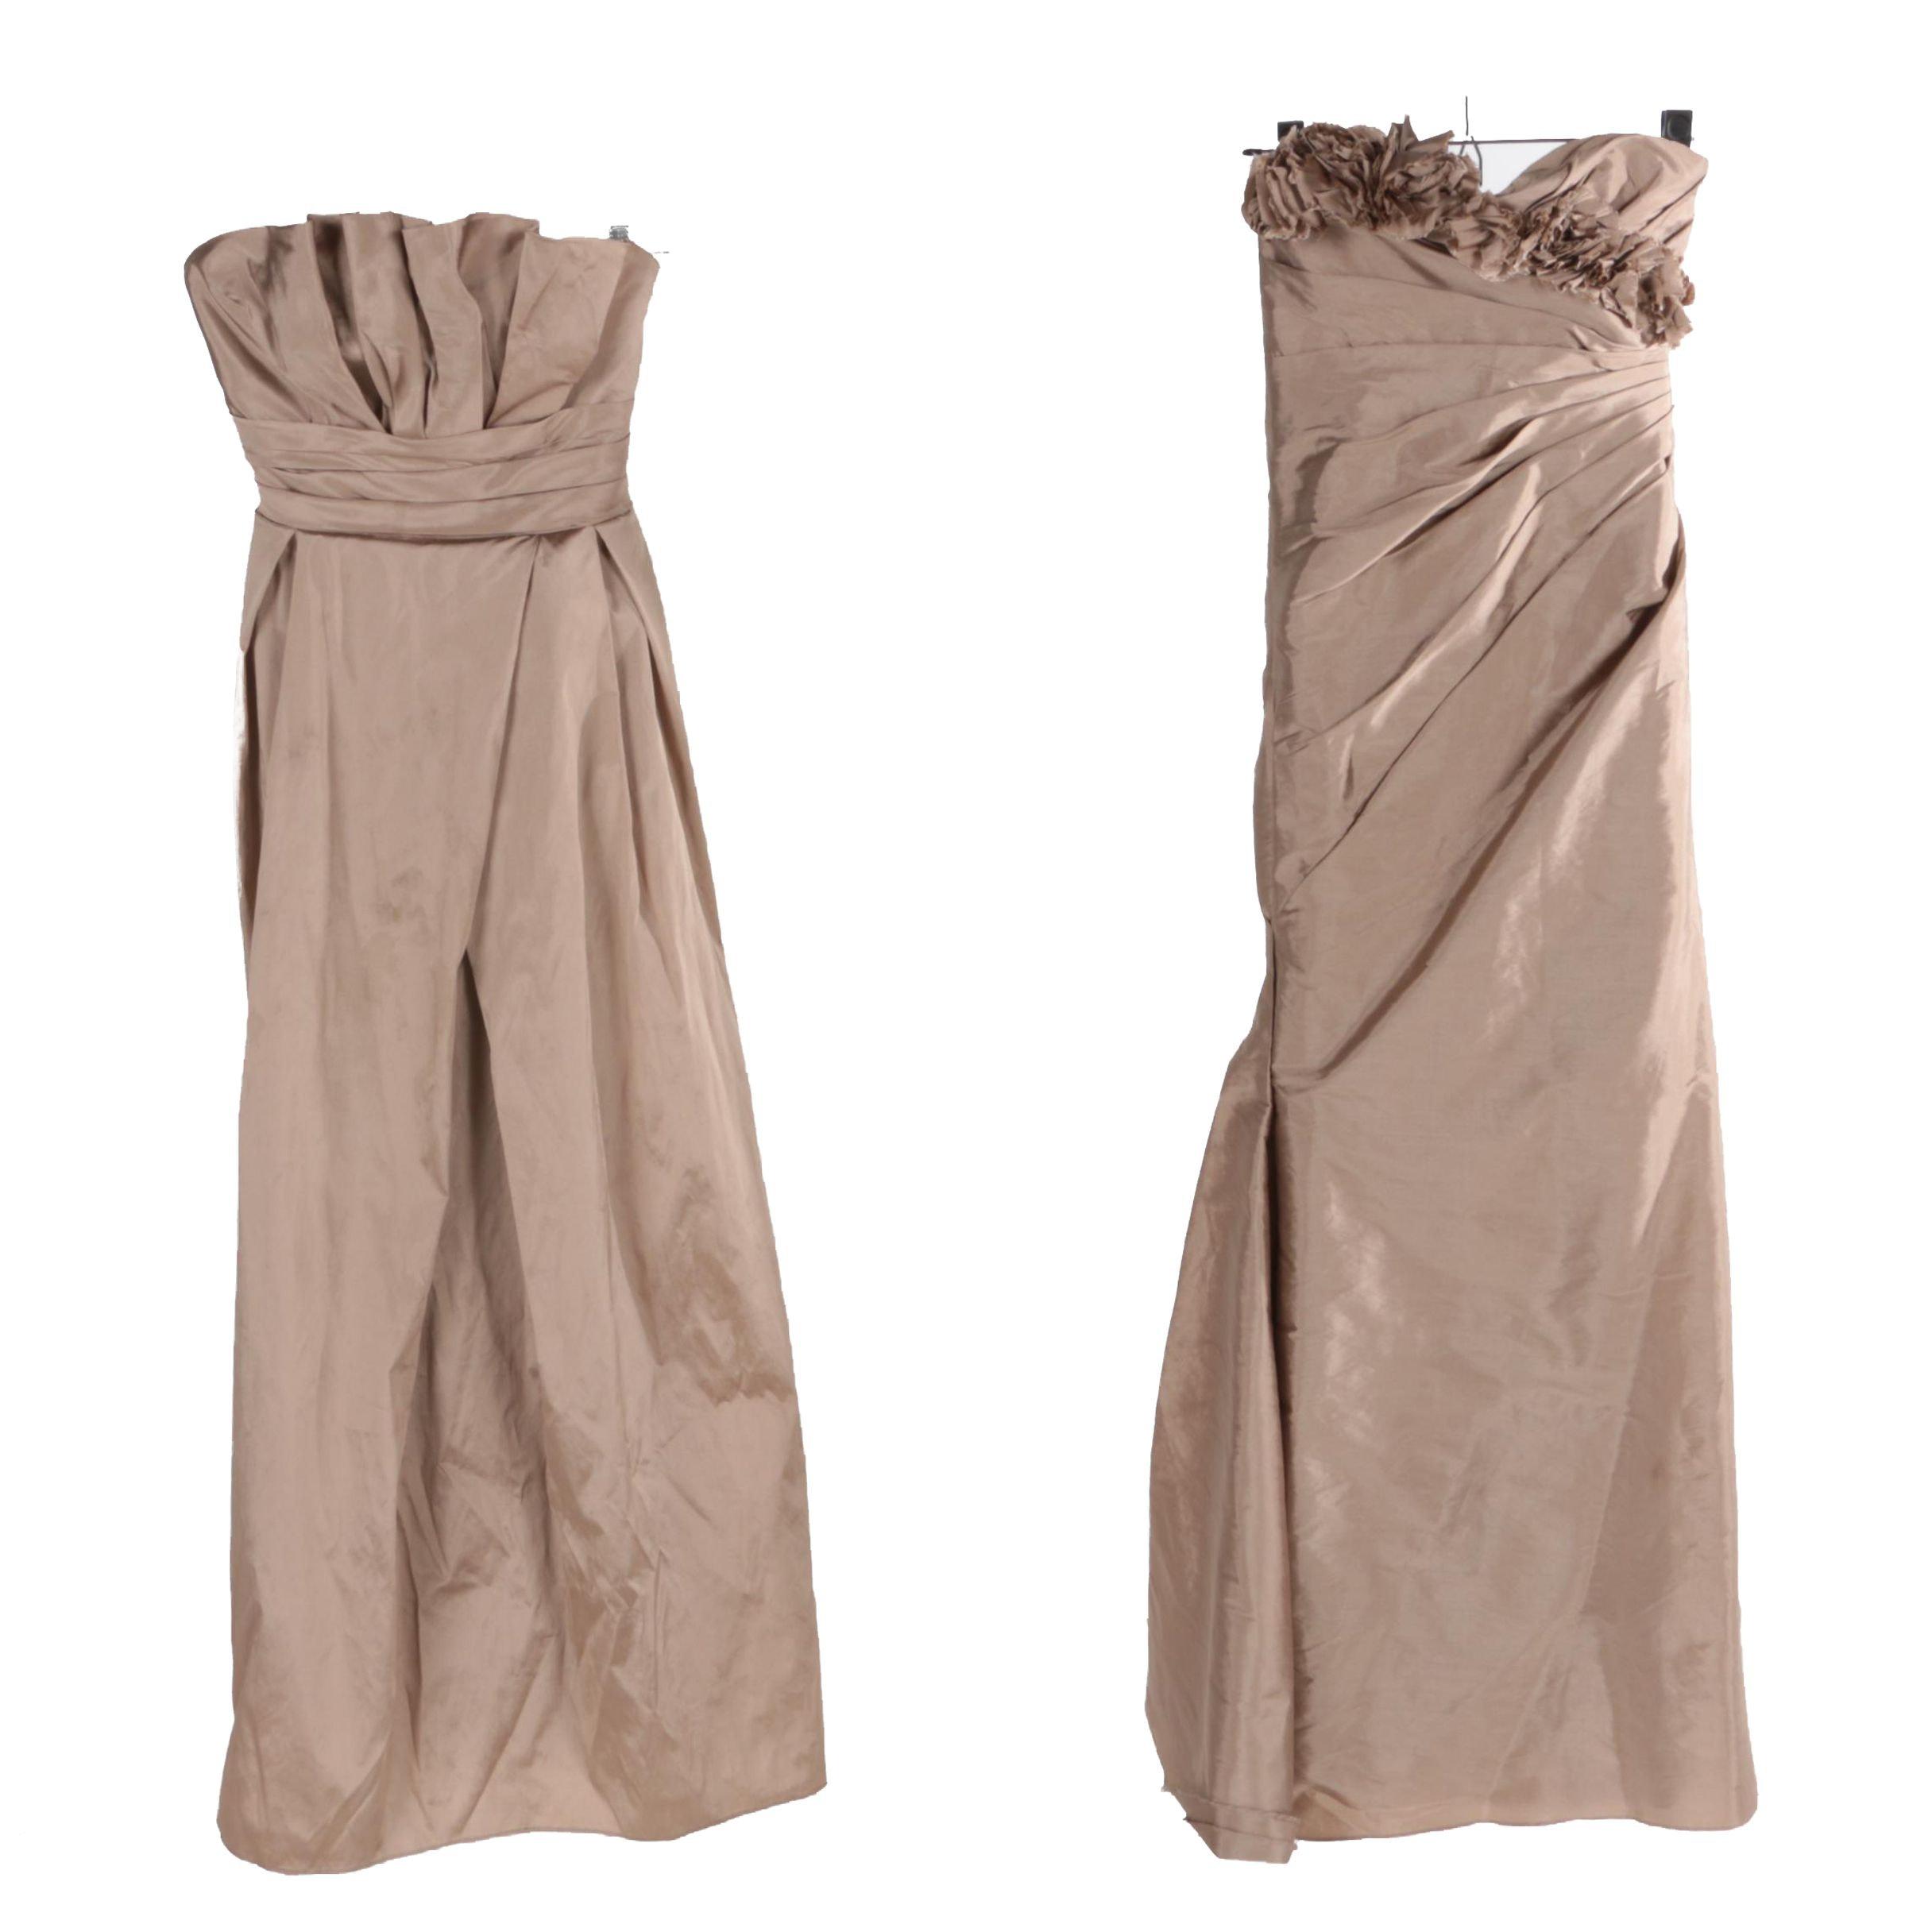 Monique Lhuillier Sleeveless Bridesmaid Dresses